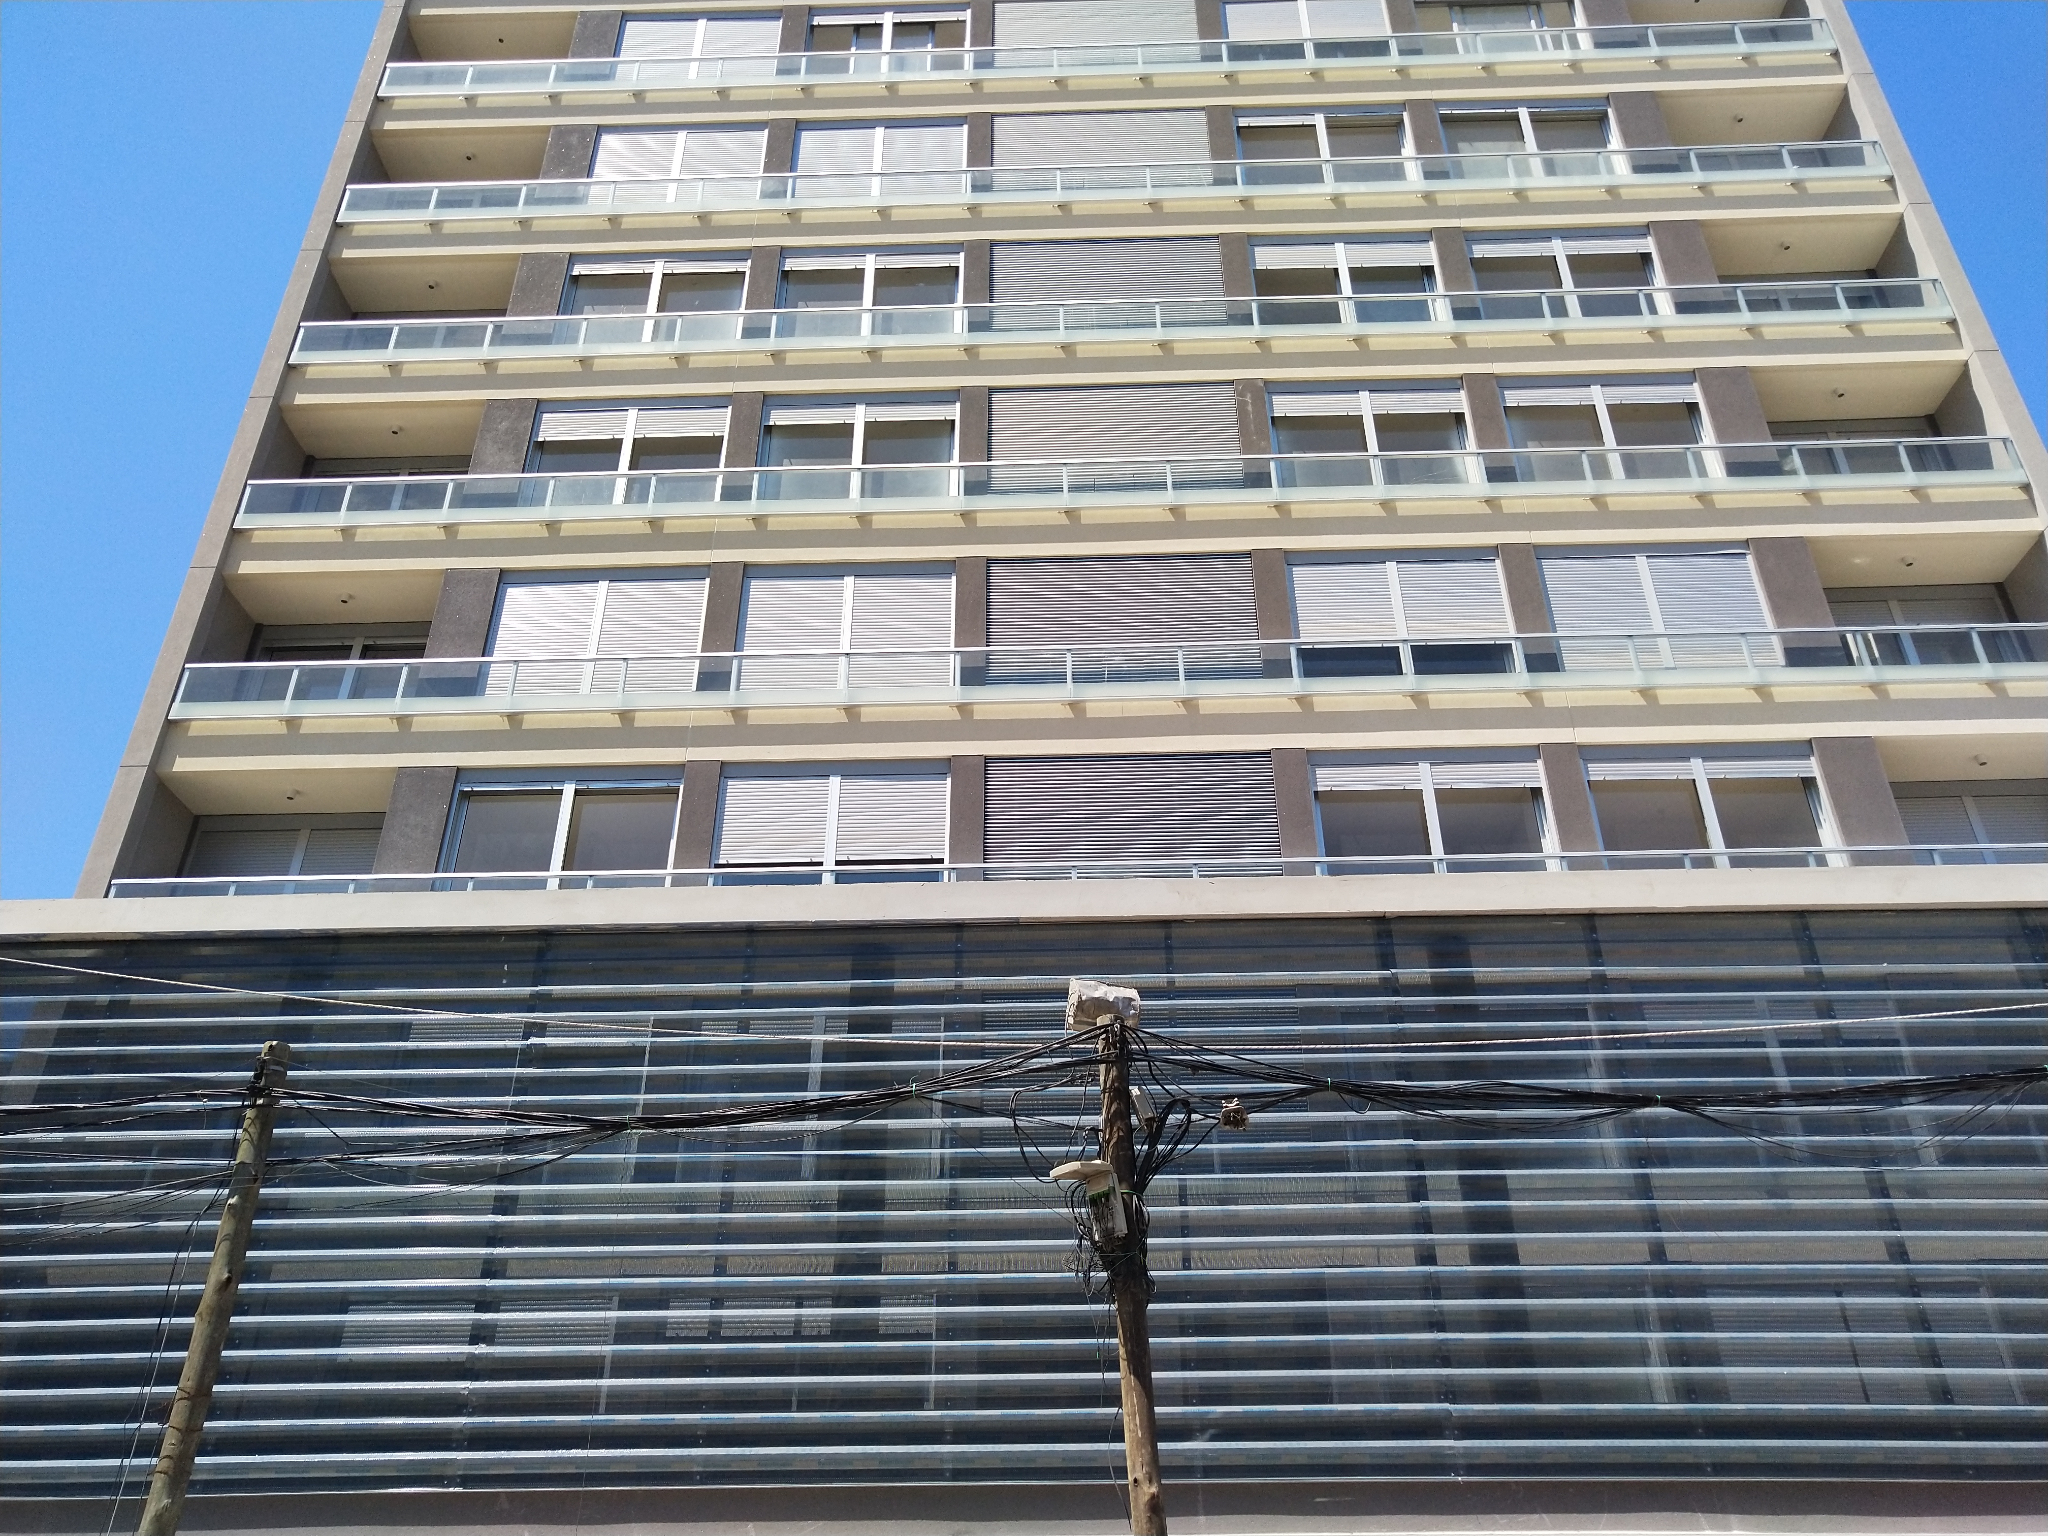 Edificio Lift Universita. Martin C. Martinez Y Brandzen